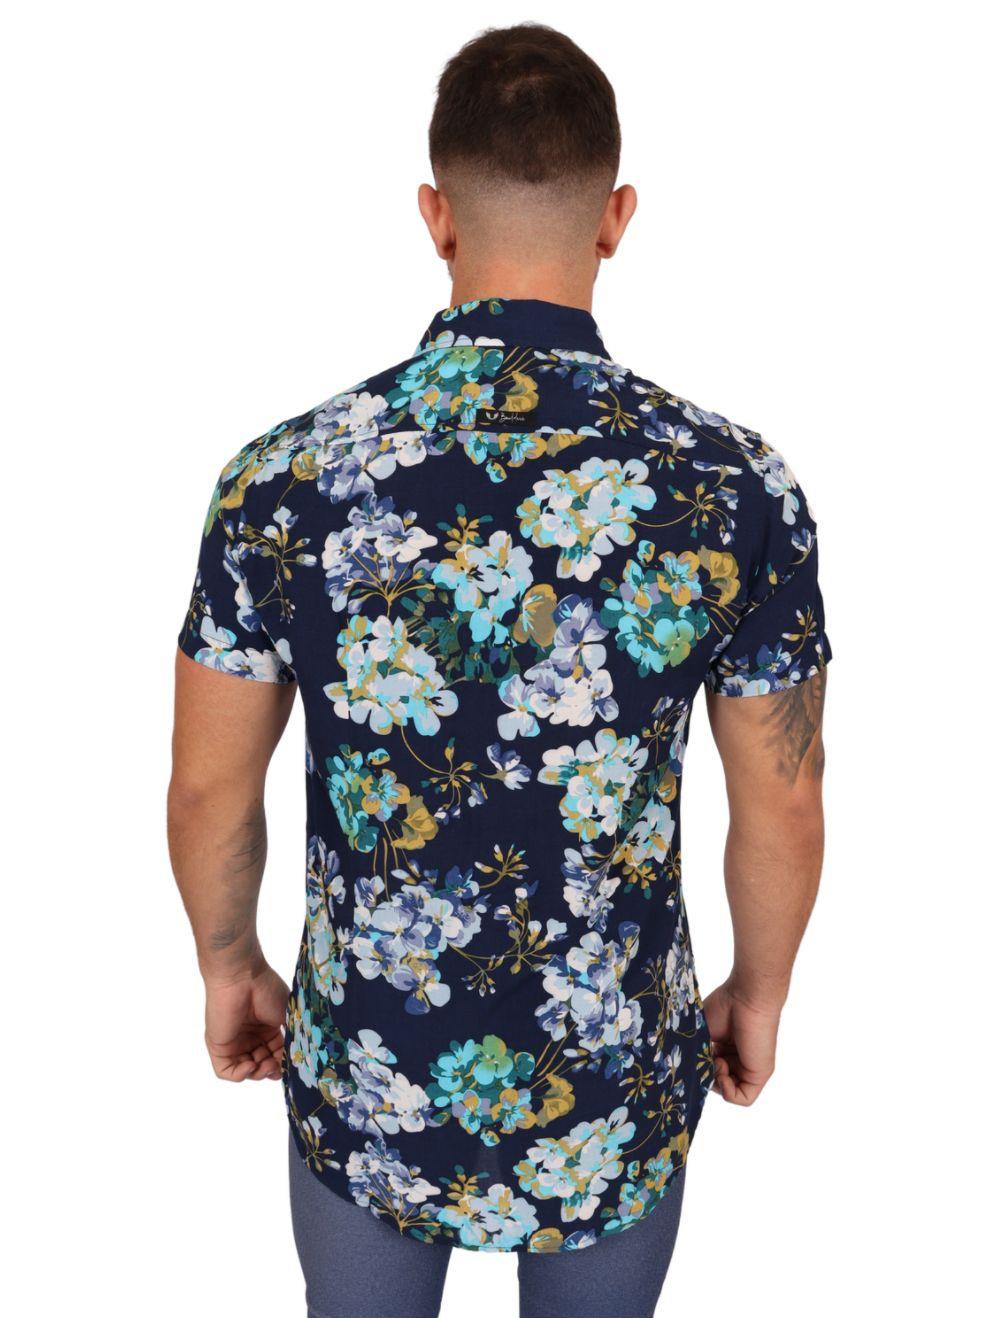 Camisa Masculina Manga Curta em Viscose Azul Marinho Floral